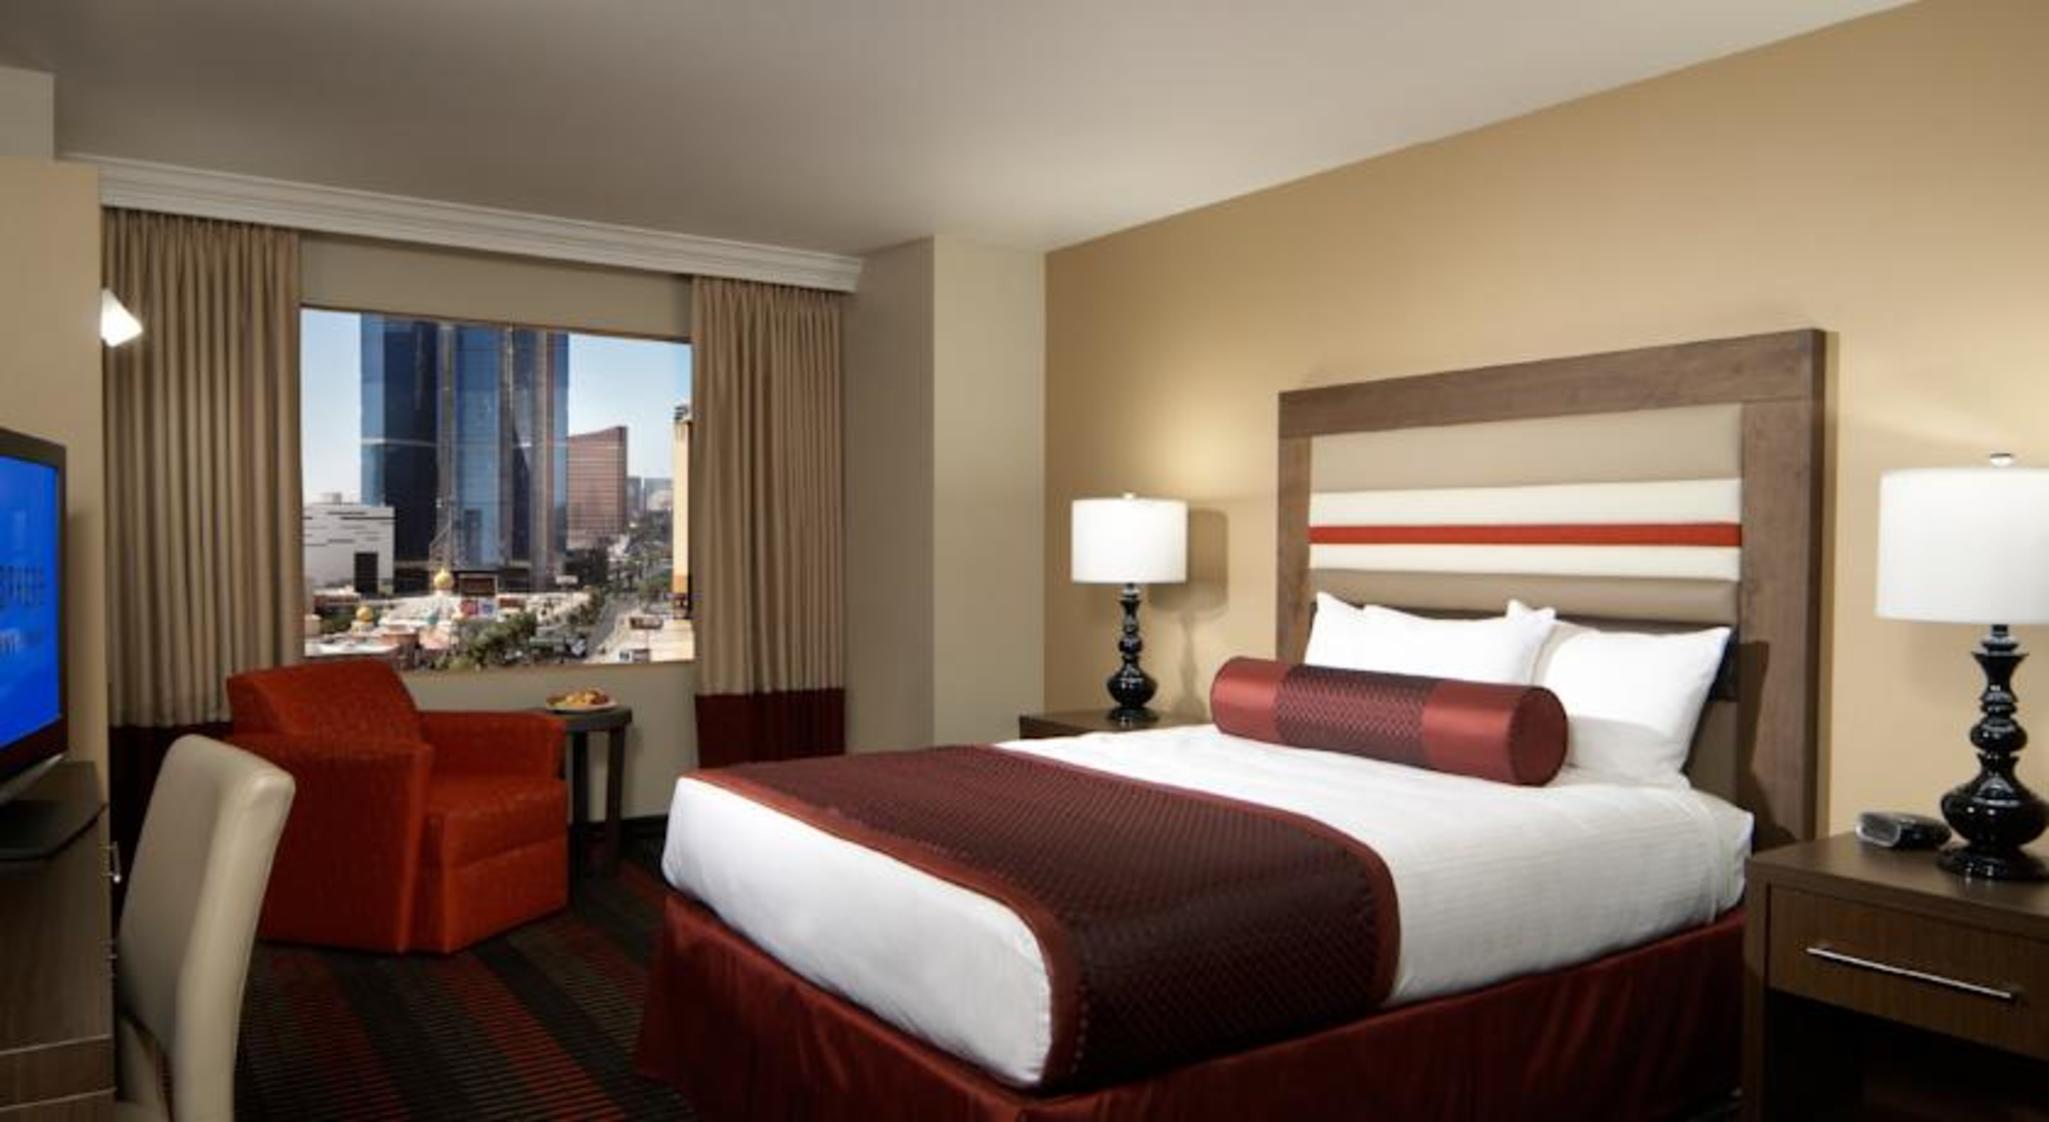 The STRAT Hotel, Casino and Skypod